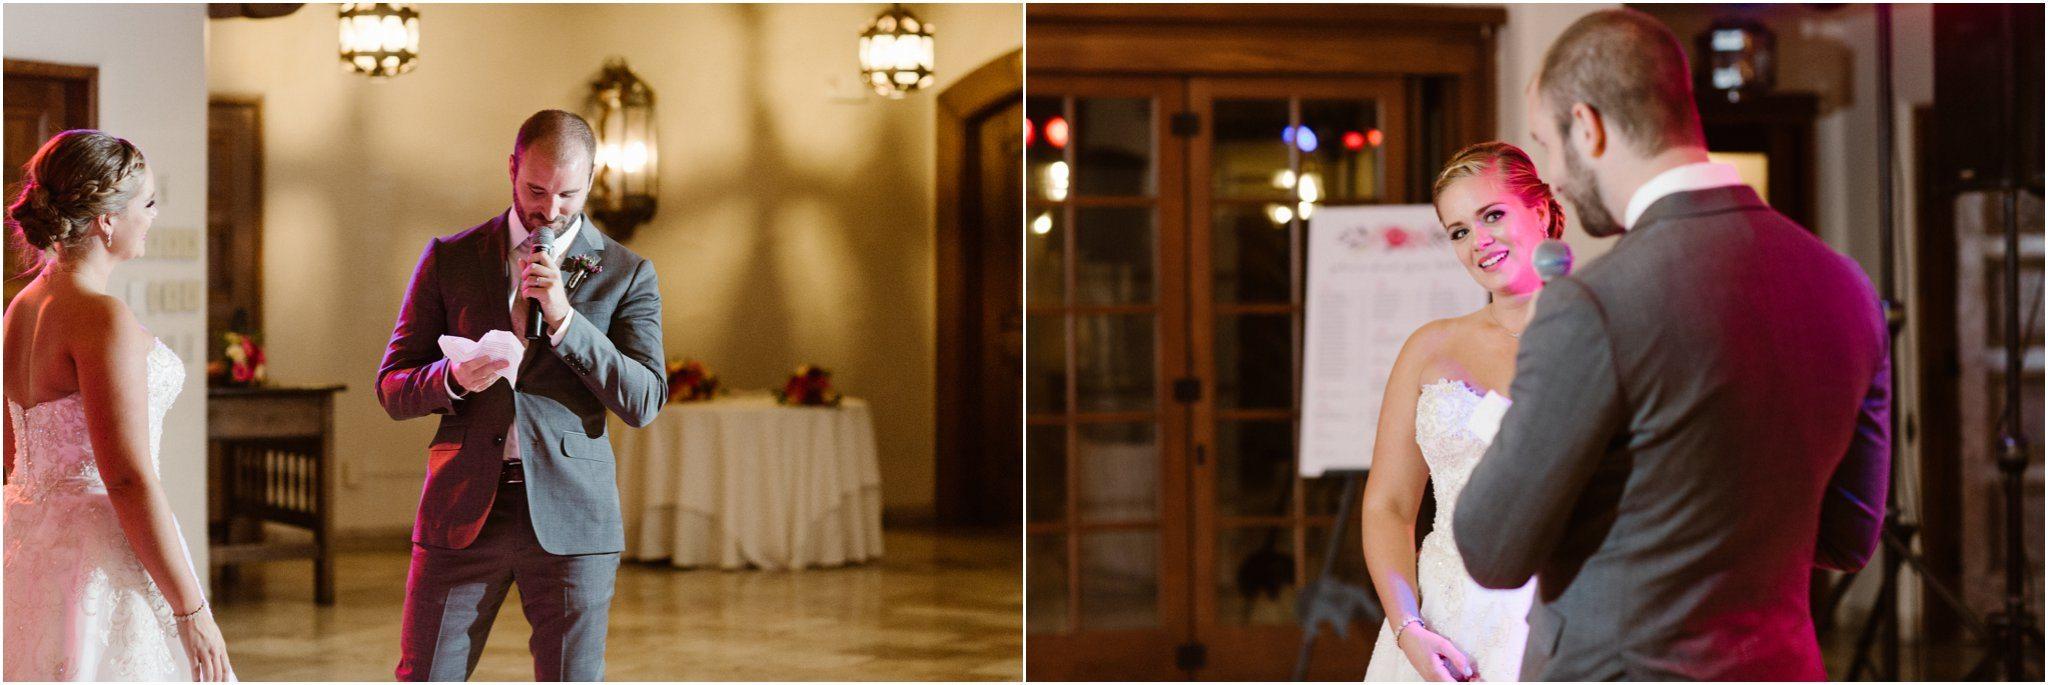 0082albuquerque-wedding-photographer_-santa-fe-wedding-photographer_-southwest-wedding-photography_-blue-rose-studio